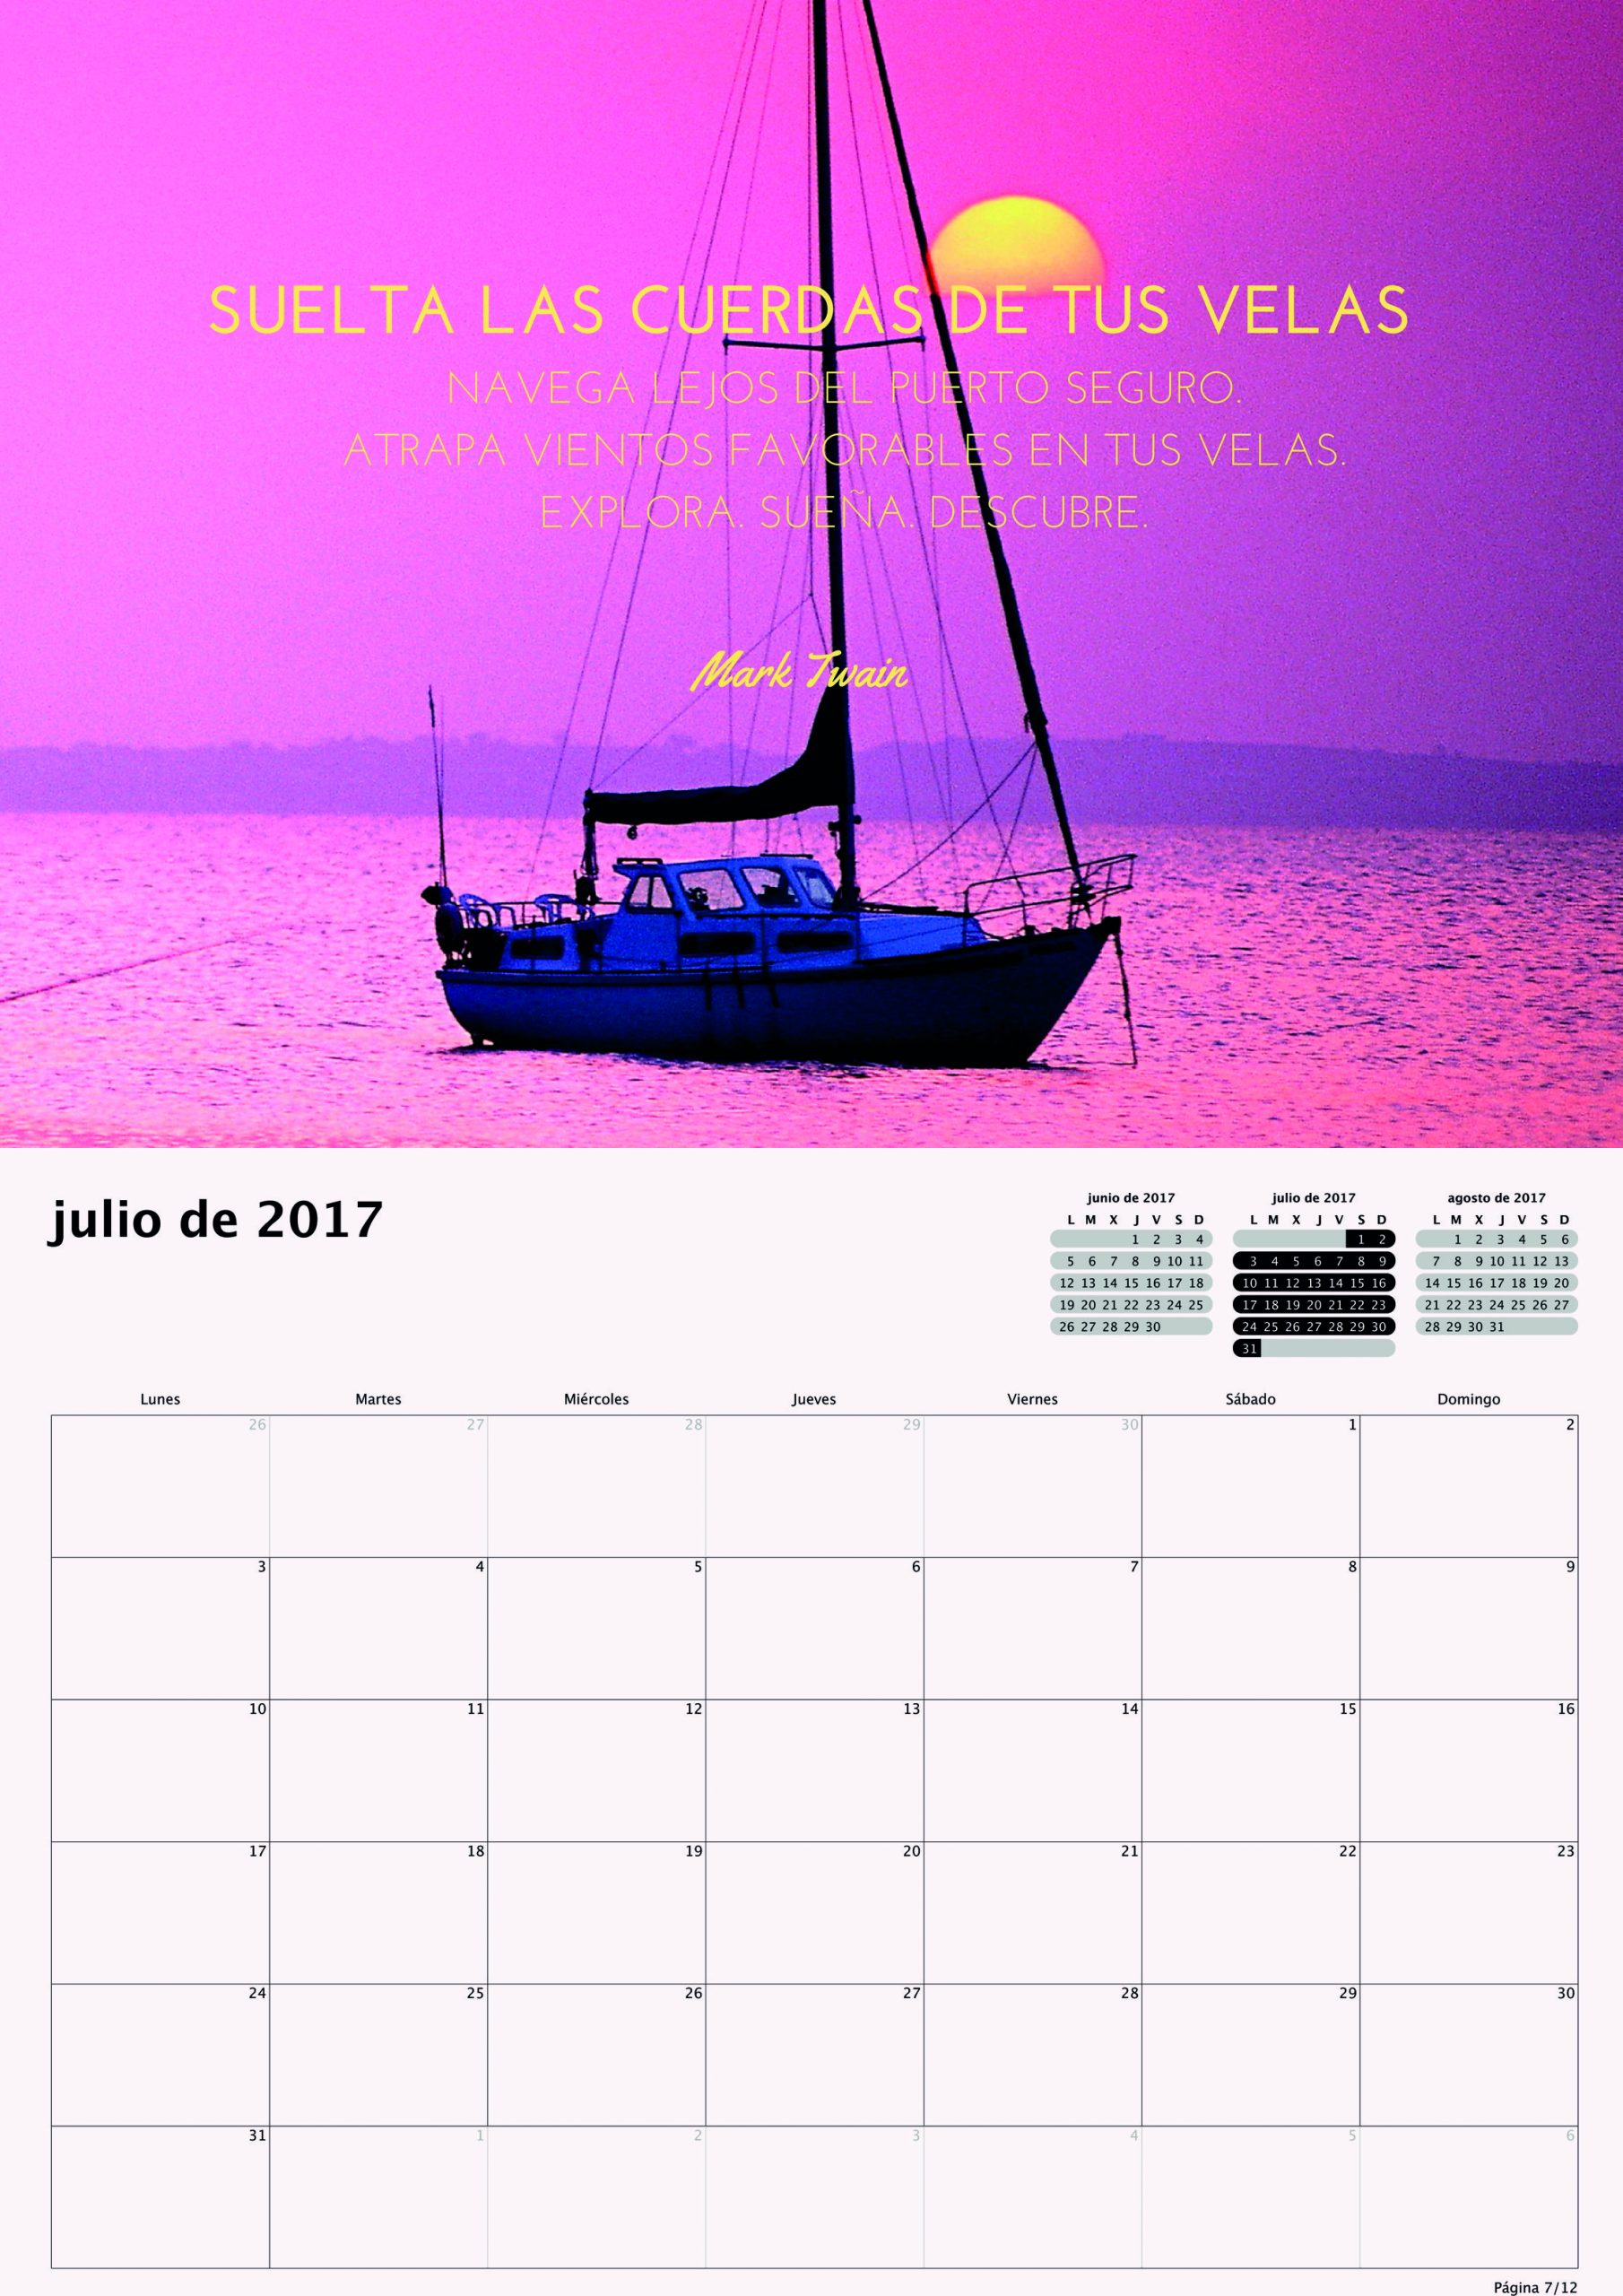 Calendario 2017 para Pequeños Saltamontes - julio